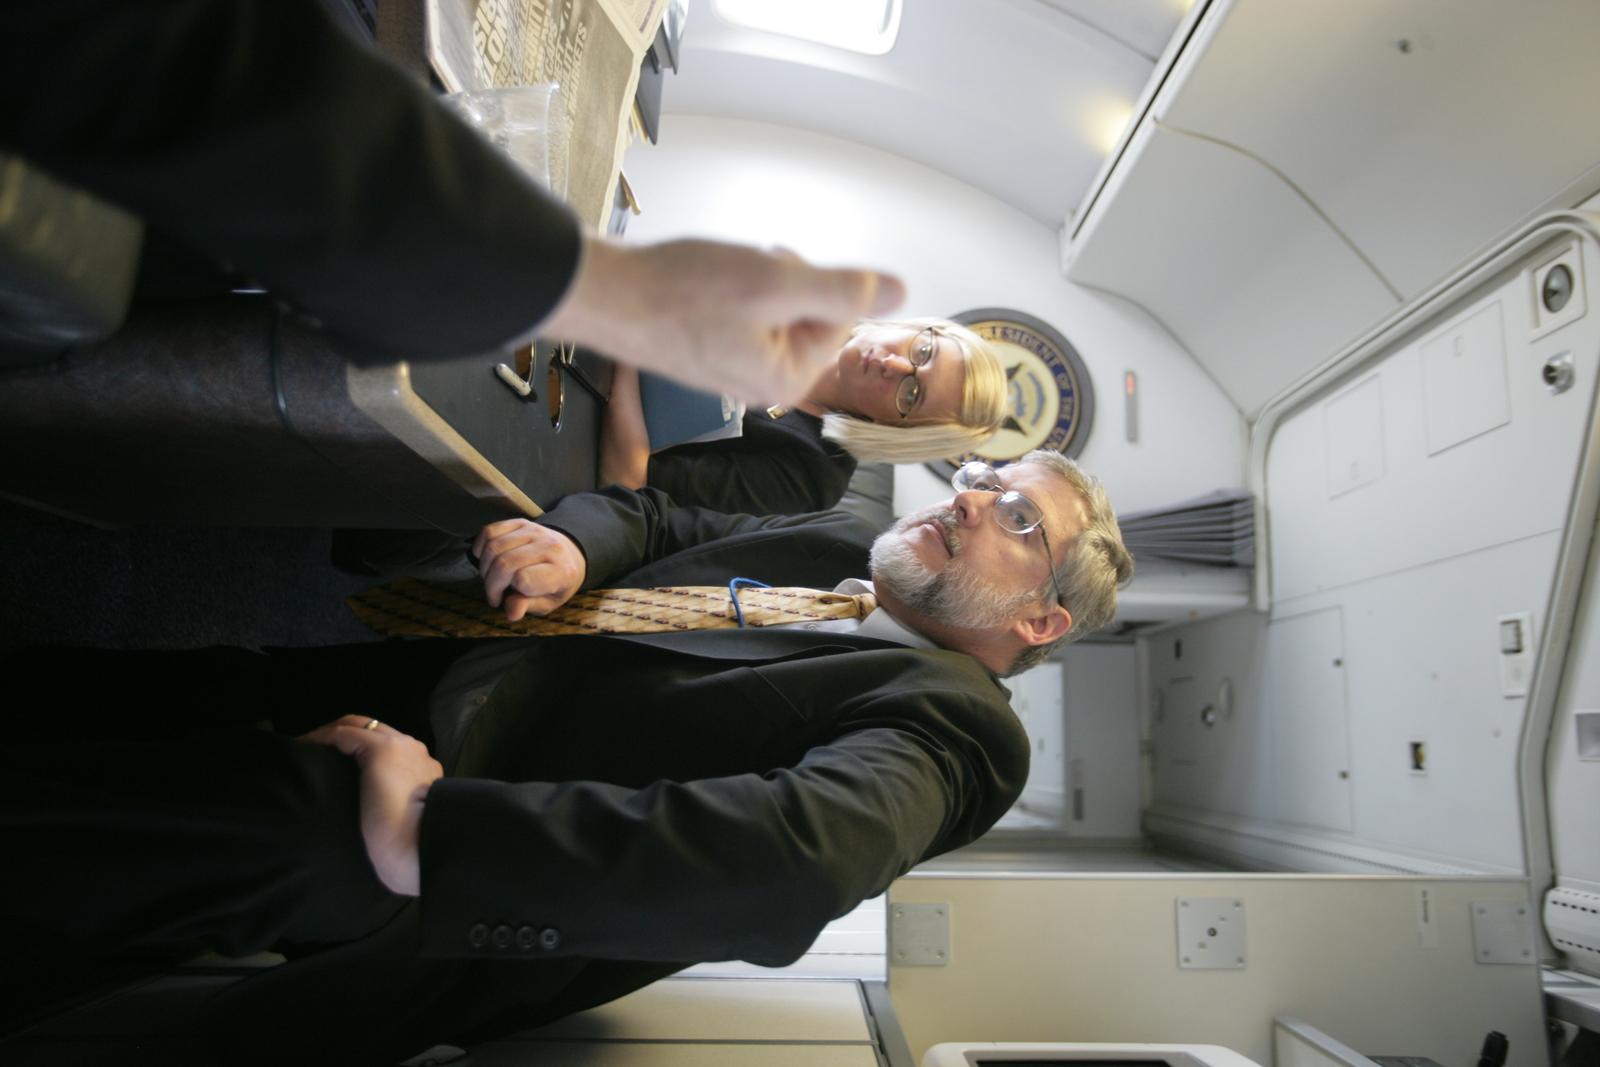 Vice President Cheney Talks With David Addington and Megan McGinn Aboard Air Force Two En Route to Salt Lake City, Utah